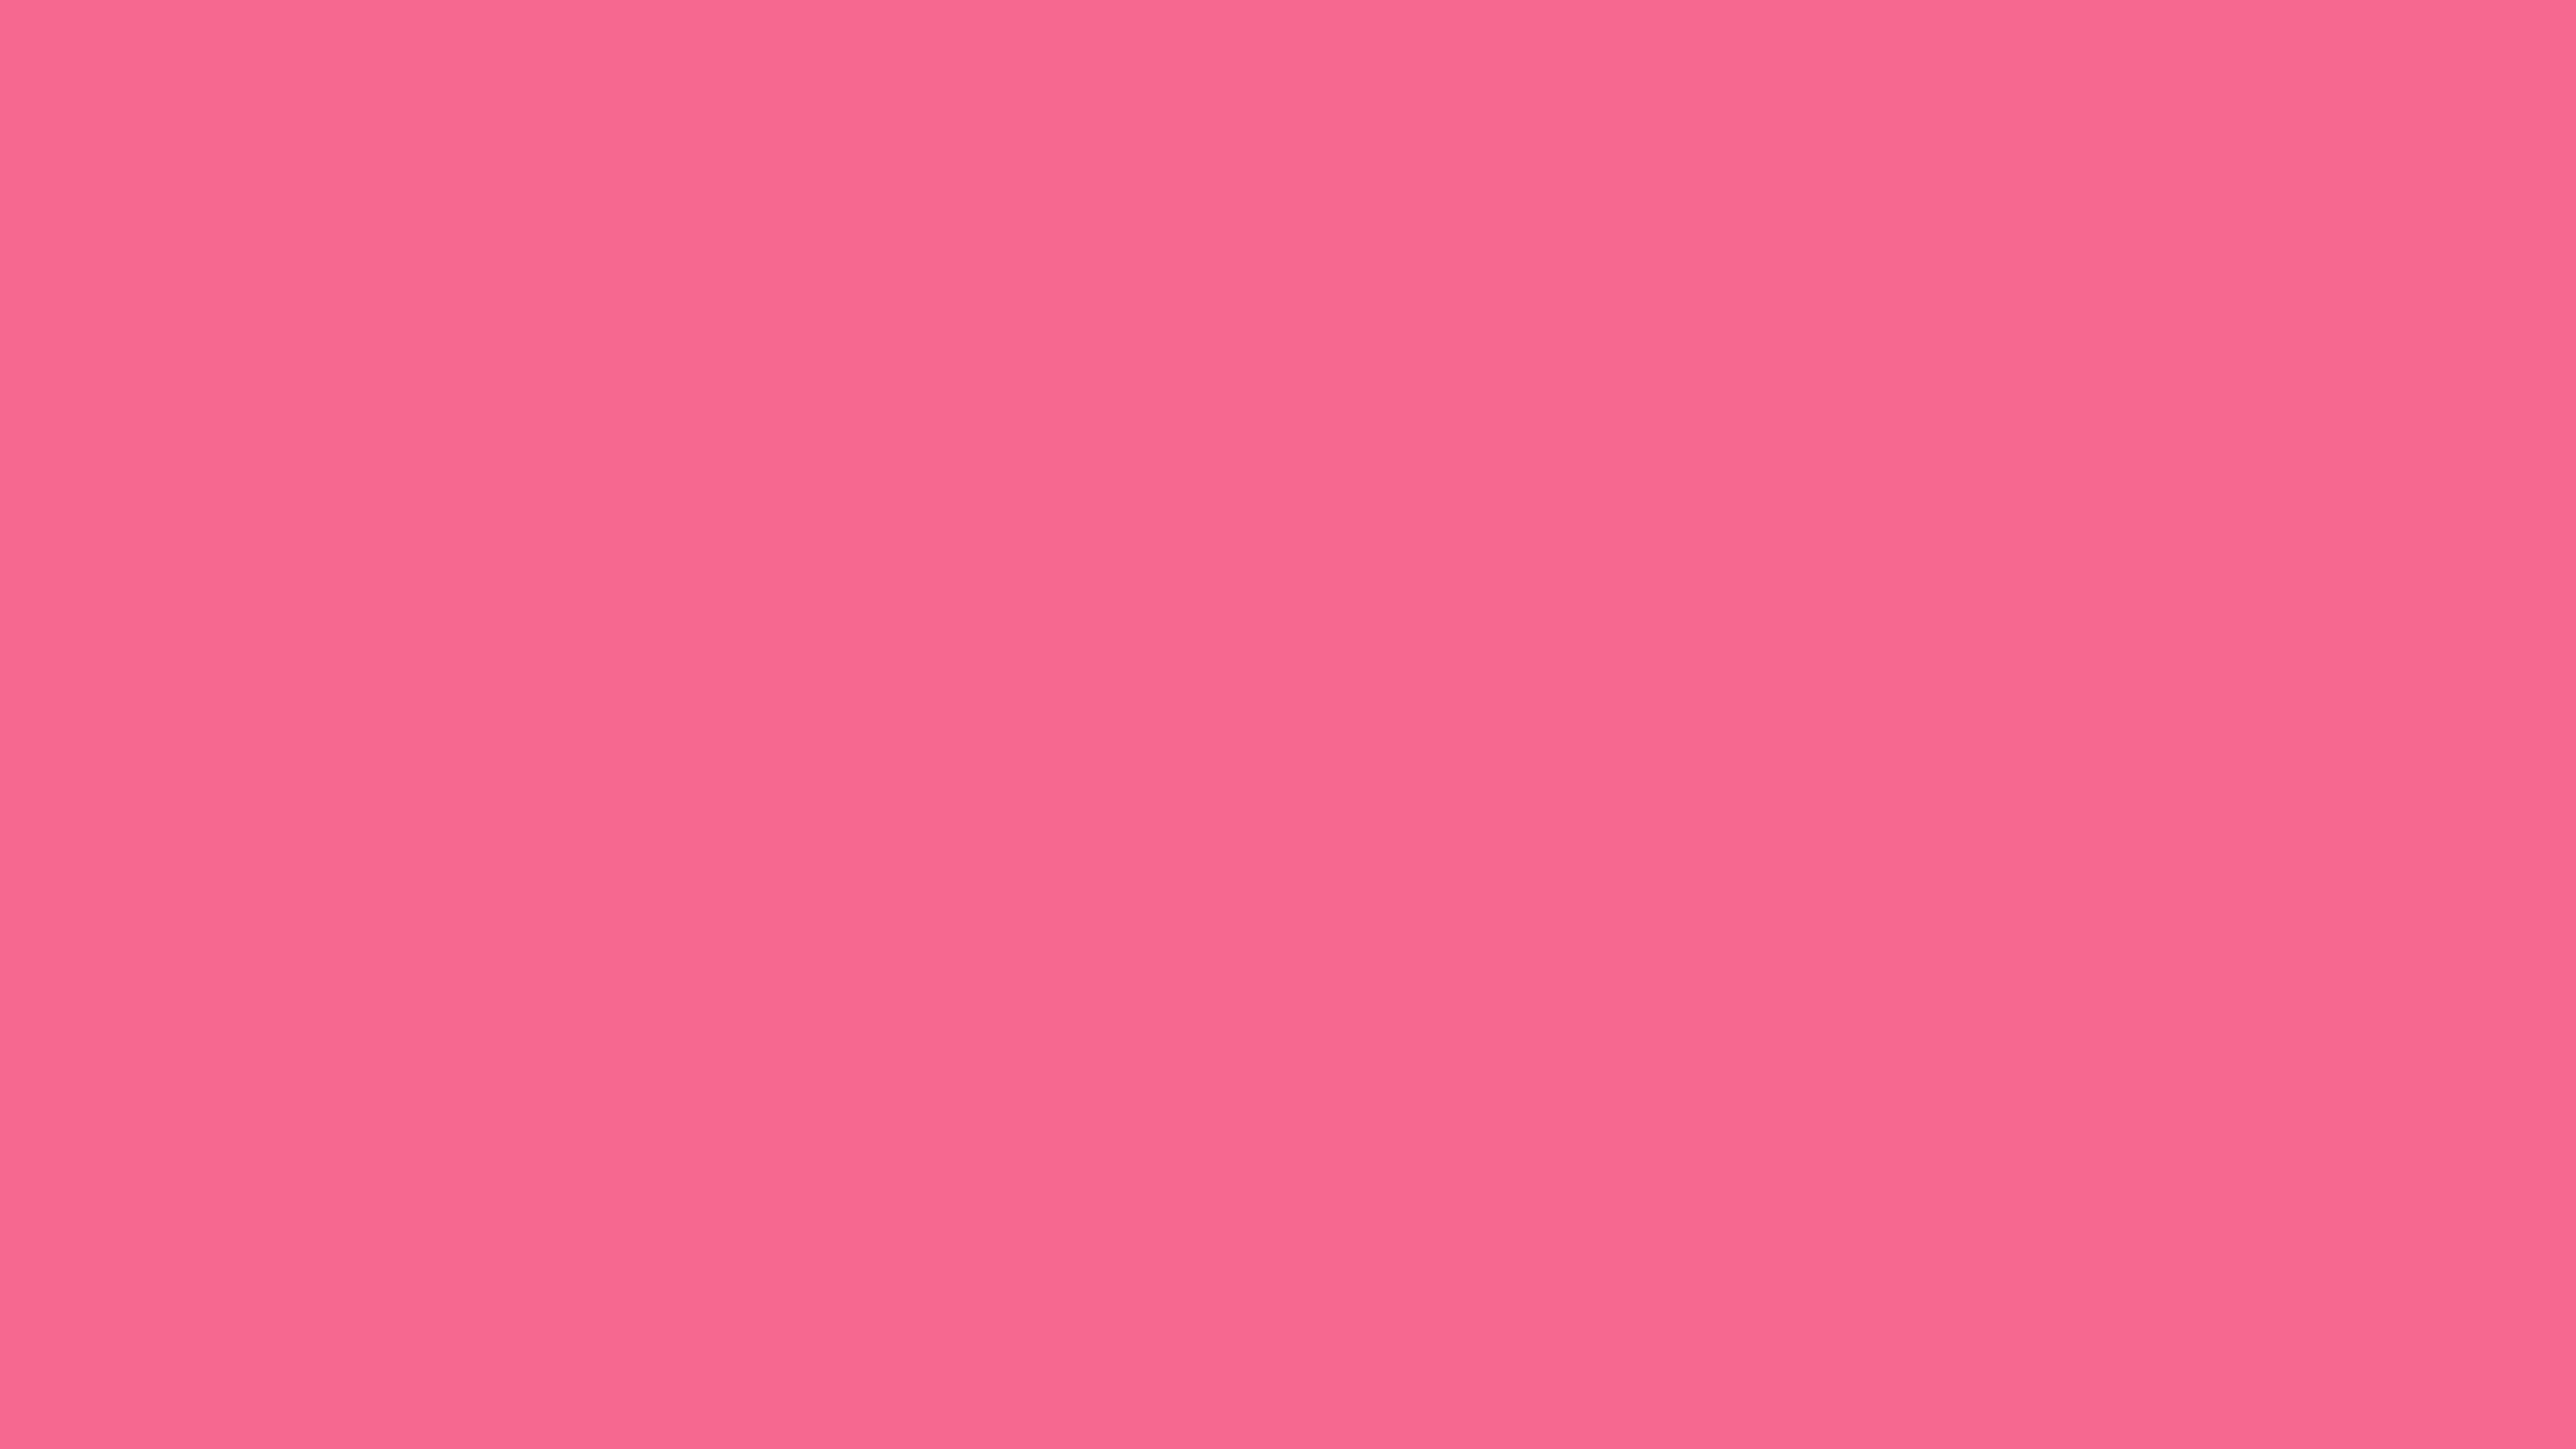 4096x2304 Light Crimson Solid Color Background